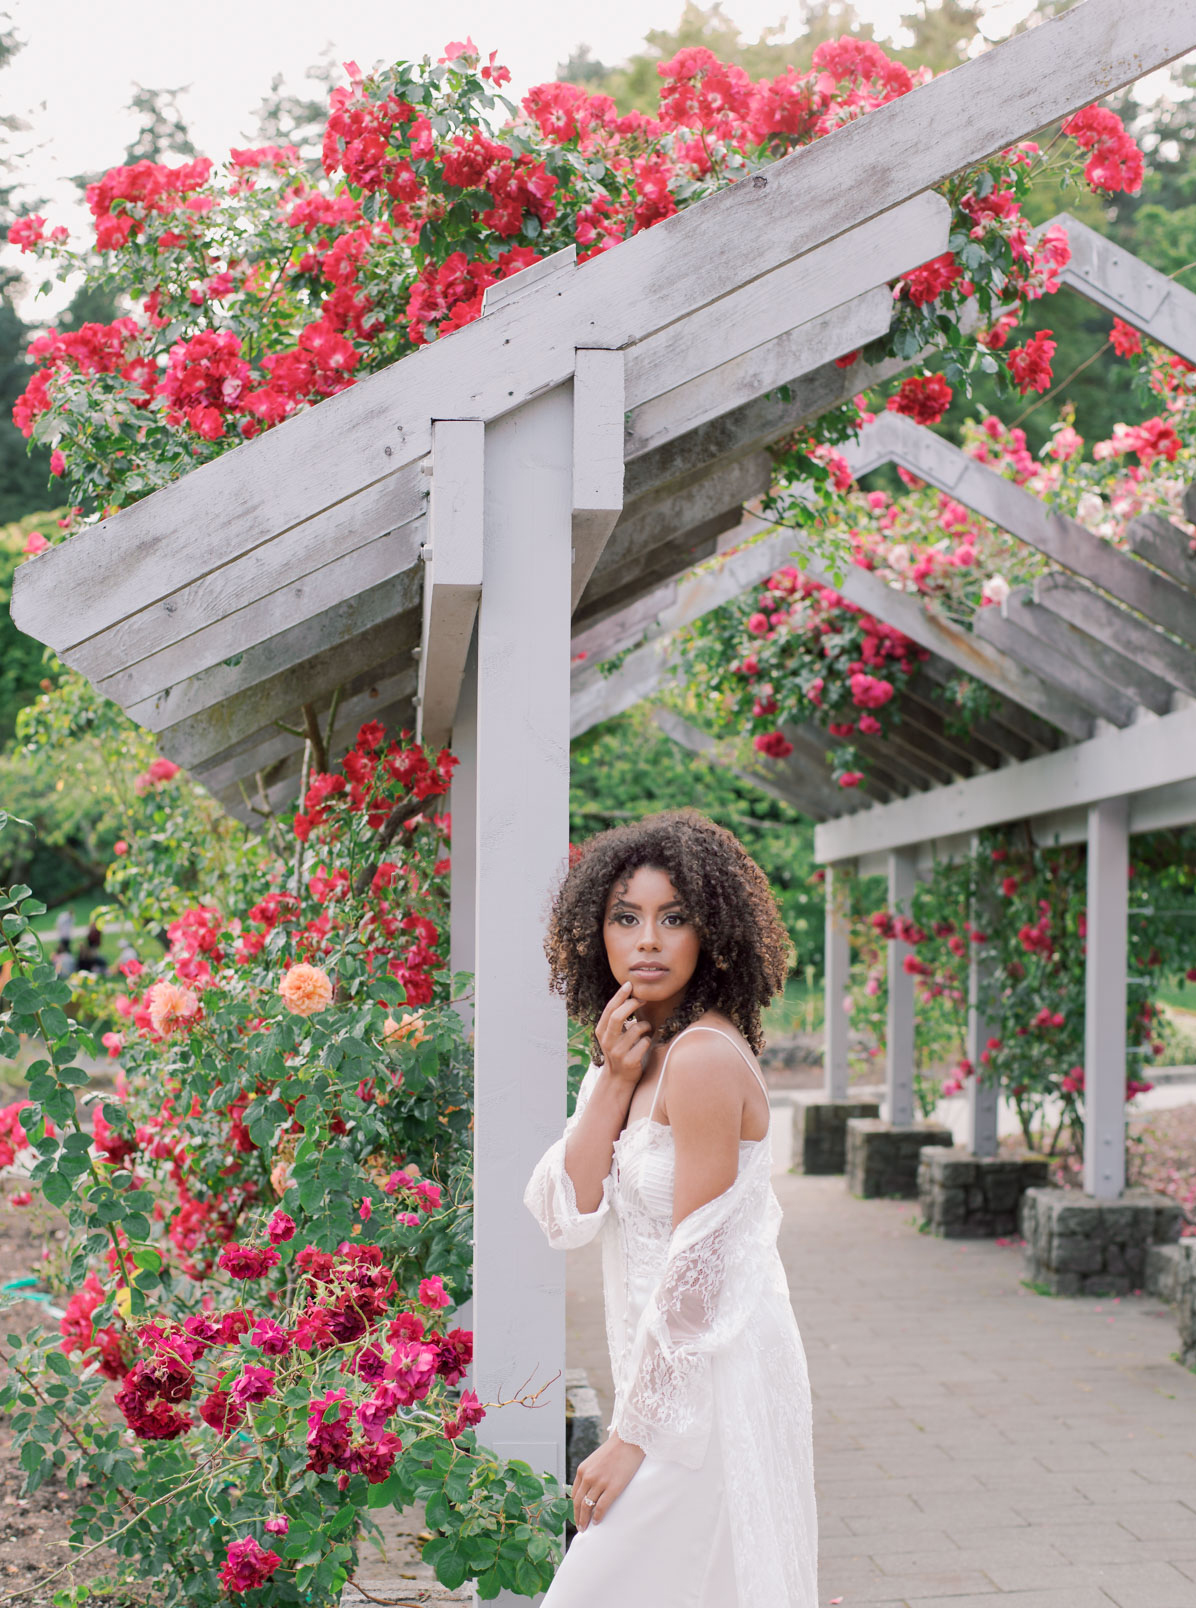 Stanley Park Rose Garden Boudoir